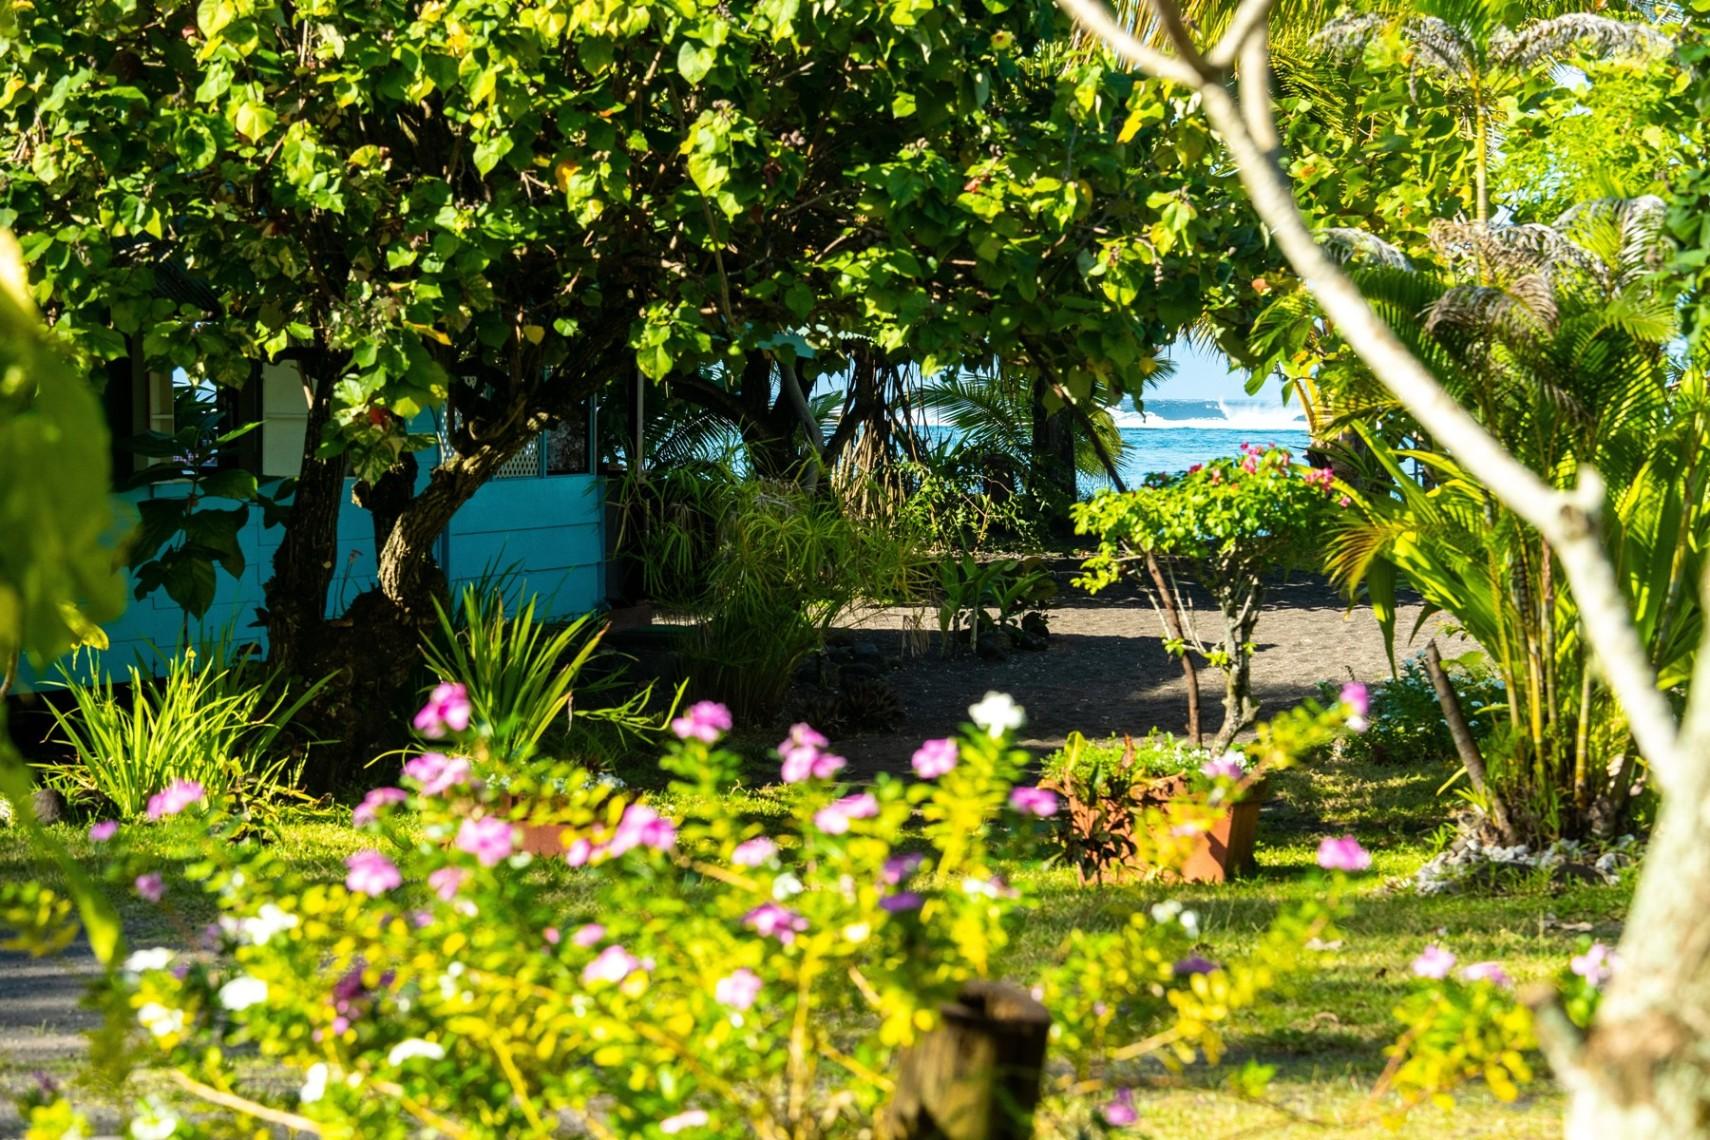 https://tahititourisme.ch/wp-content/uploads/2019/08/copie-tahiti-tourisme-800ko-1.jpg